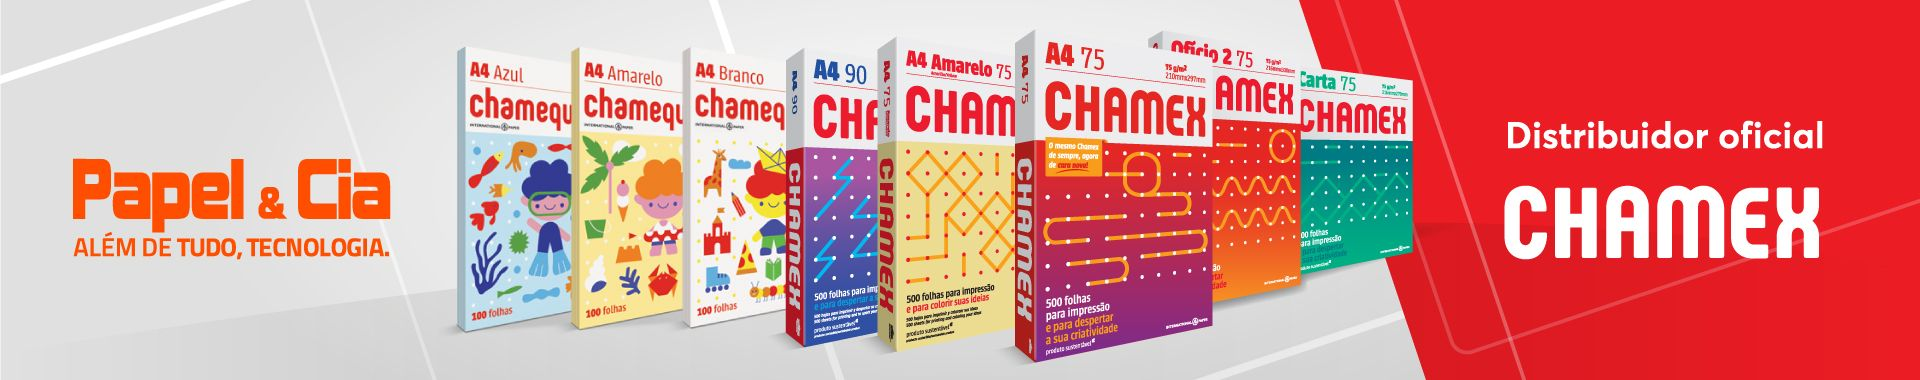 Distribuidor oficial CHAMEX